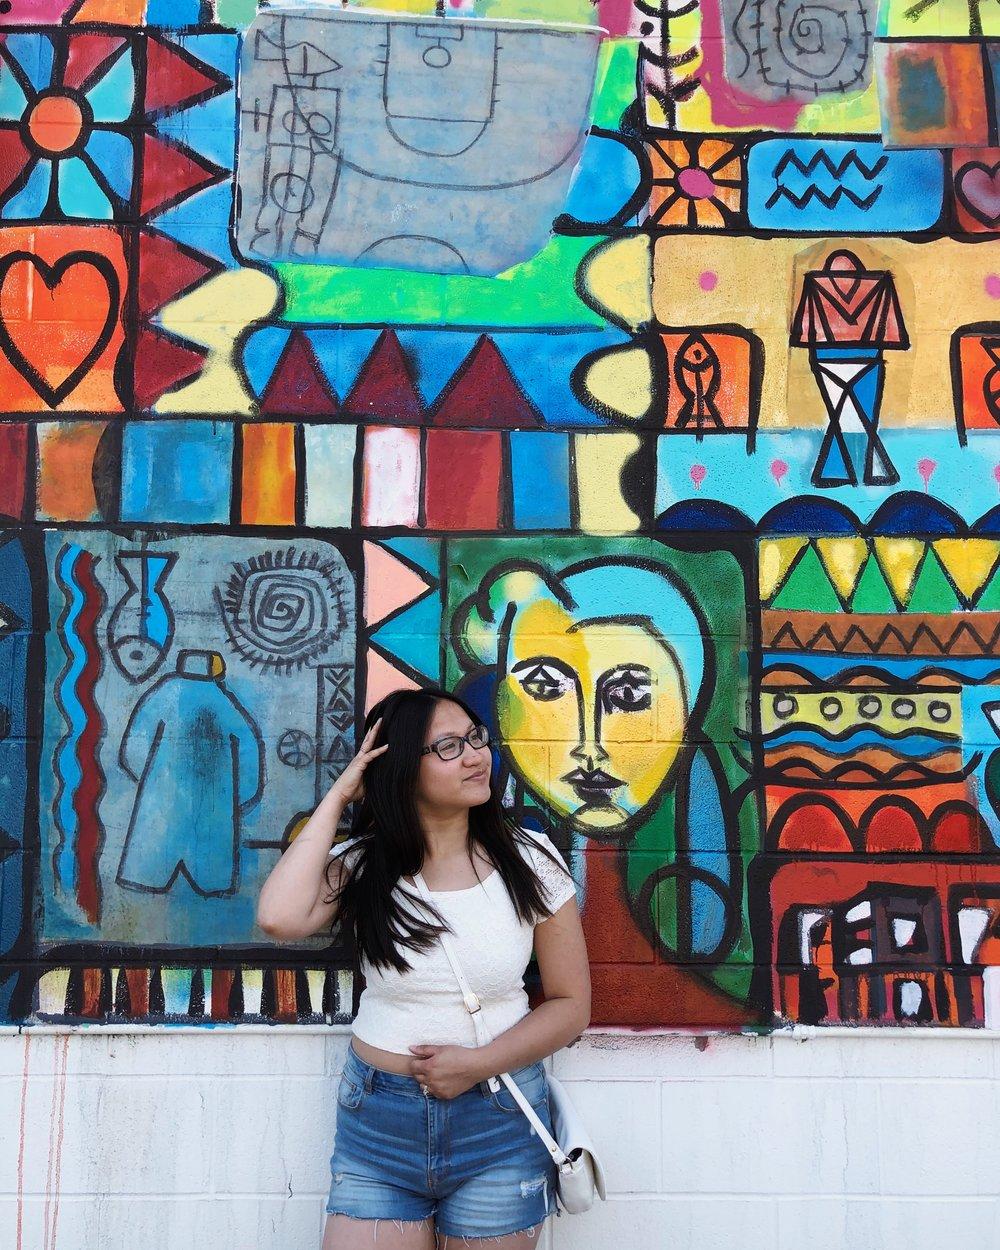 Instagrammable Walls of Edmonton Alberta Avenue 7.JPG